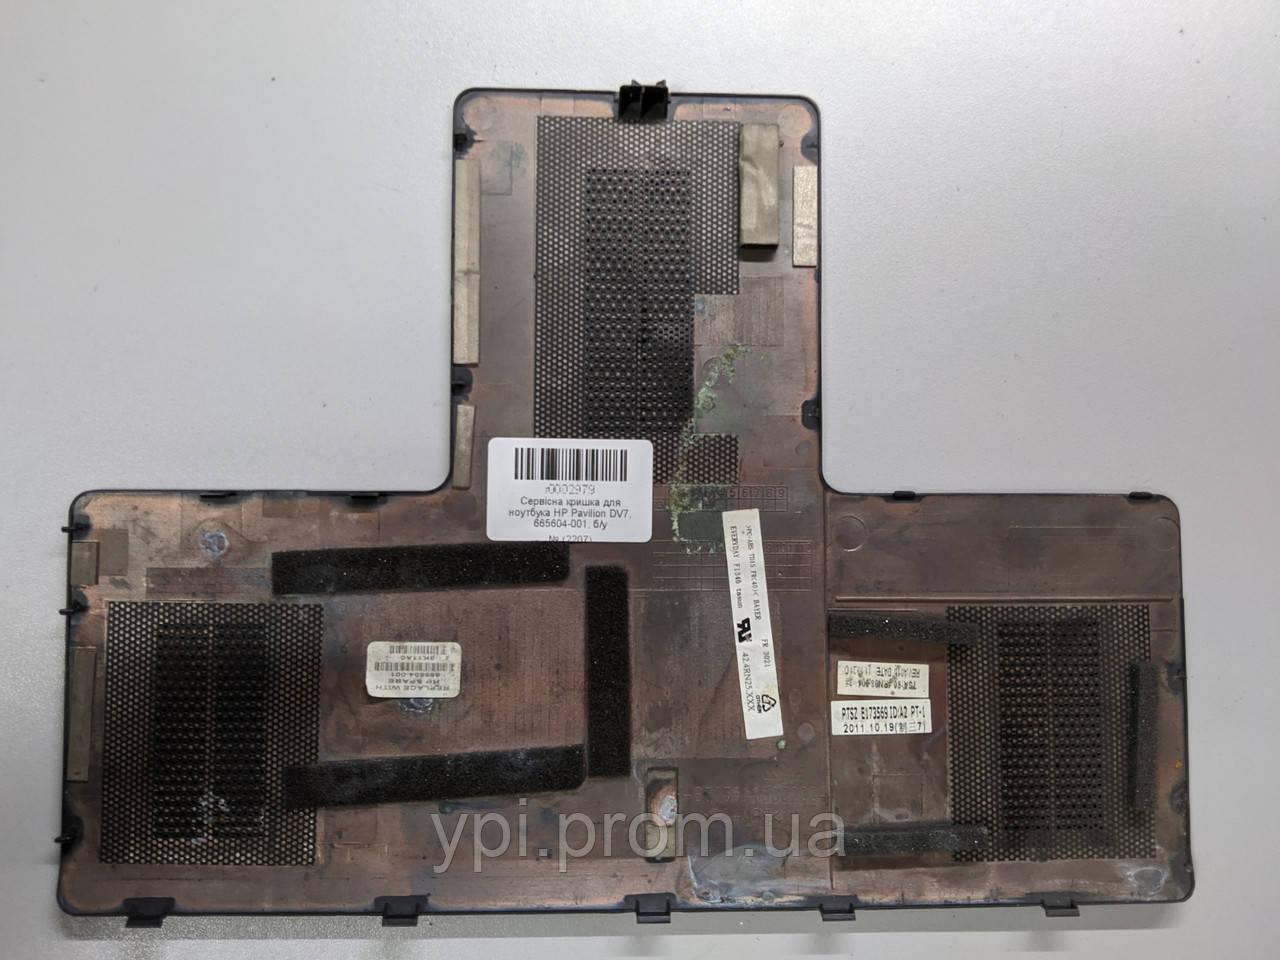 Cервисная крышка для ноутбука HP (Hewlett Packard) Pavilion DV7, 665604-001